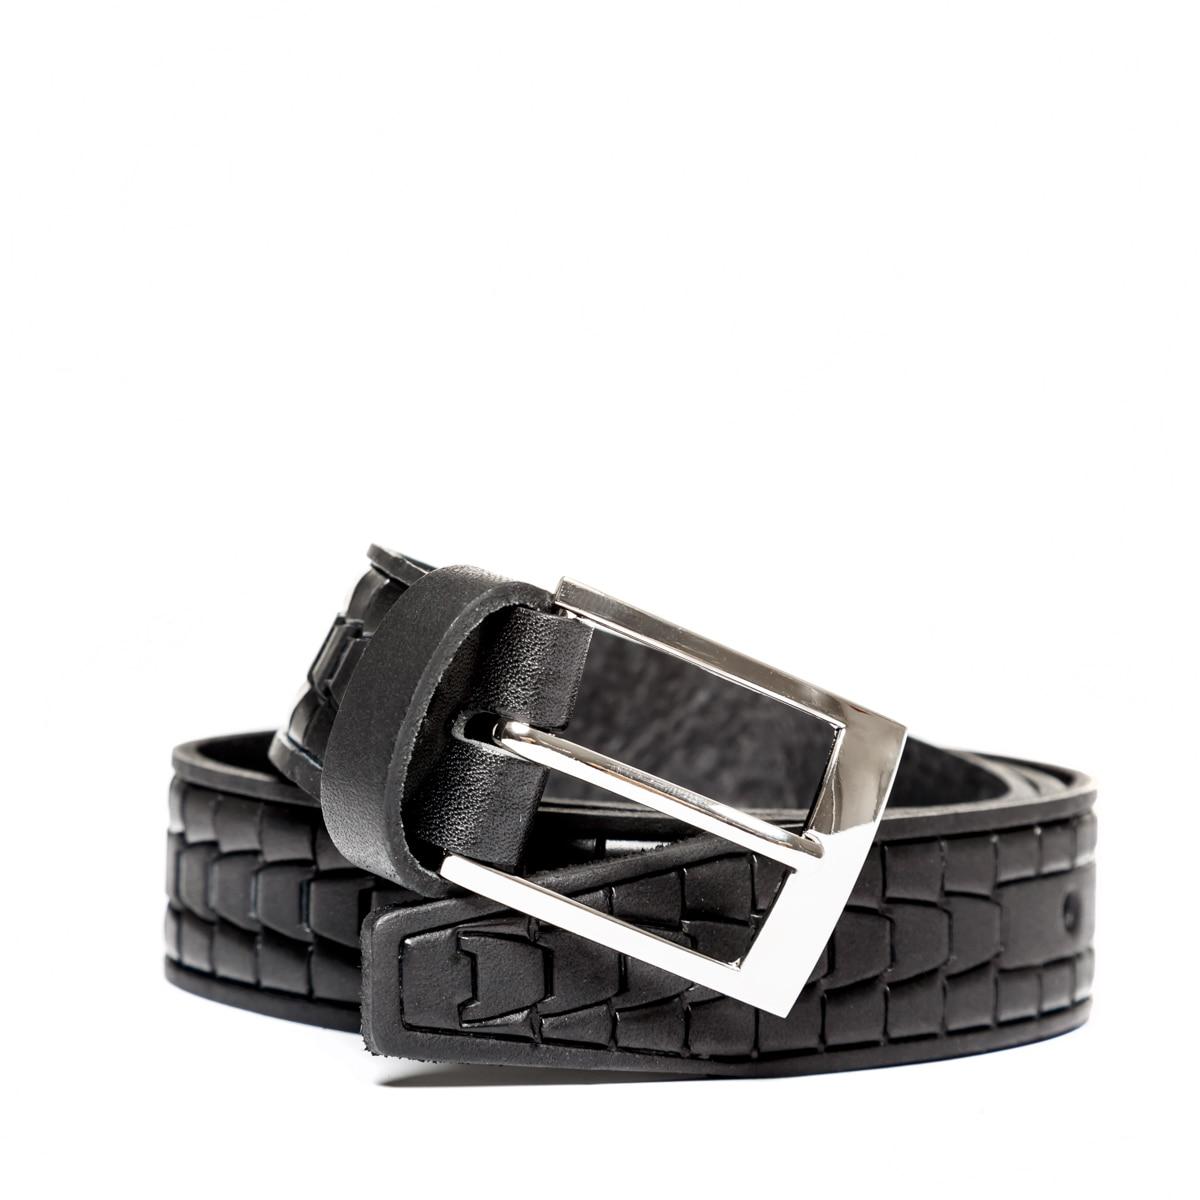 LAKESTONE belt leather teen Kiln Black for boys belt leather men s carpenter cr700 7 6 black black